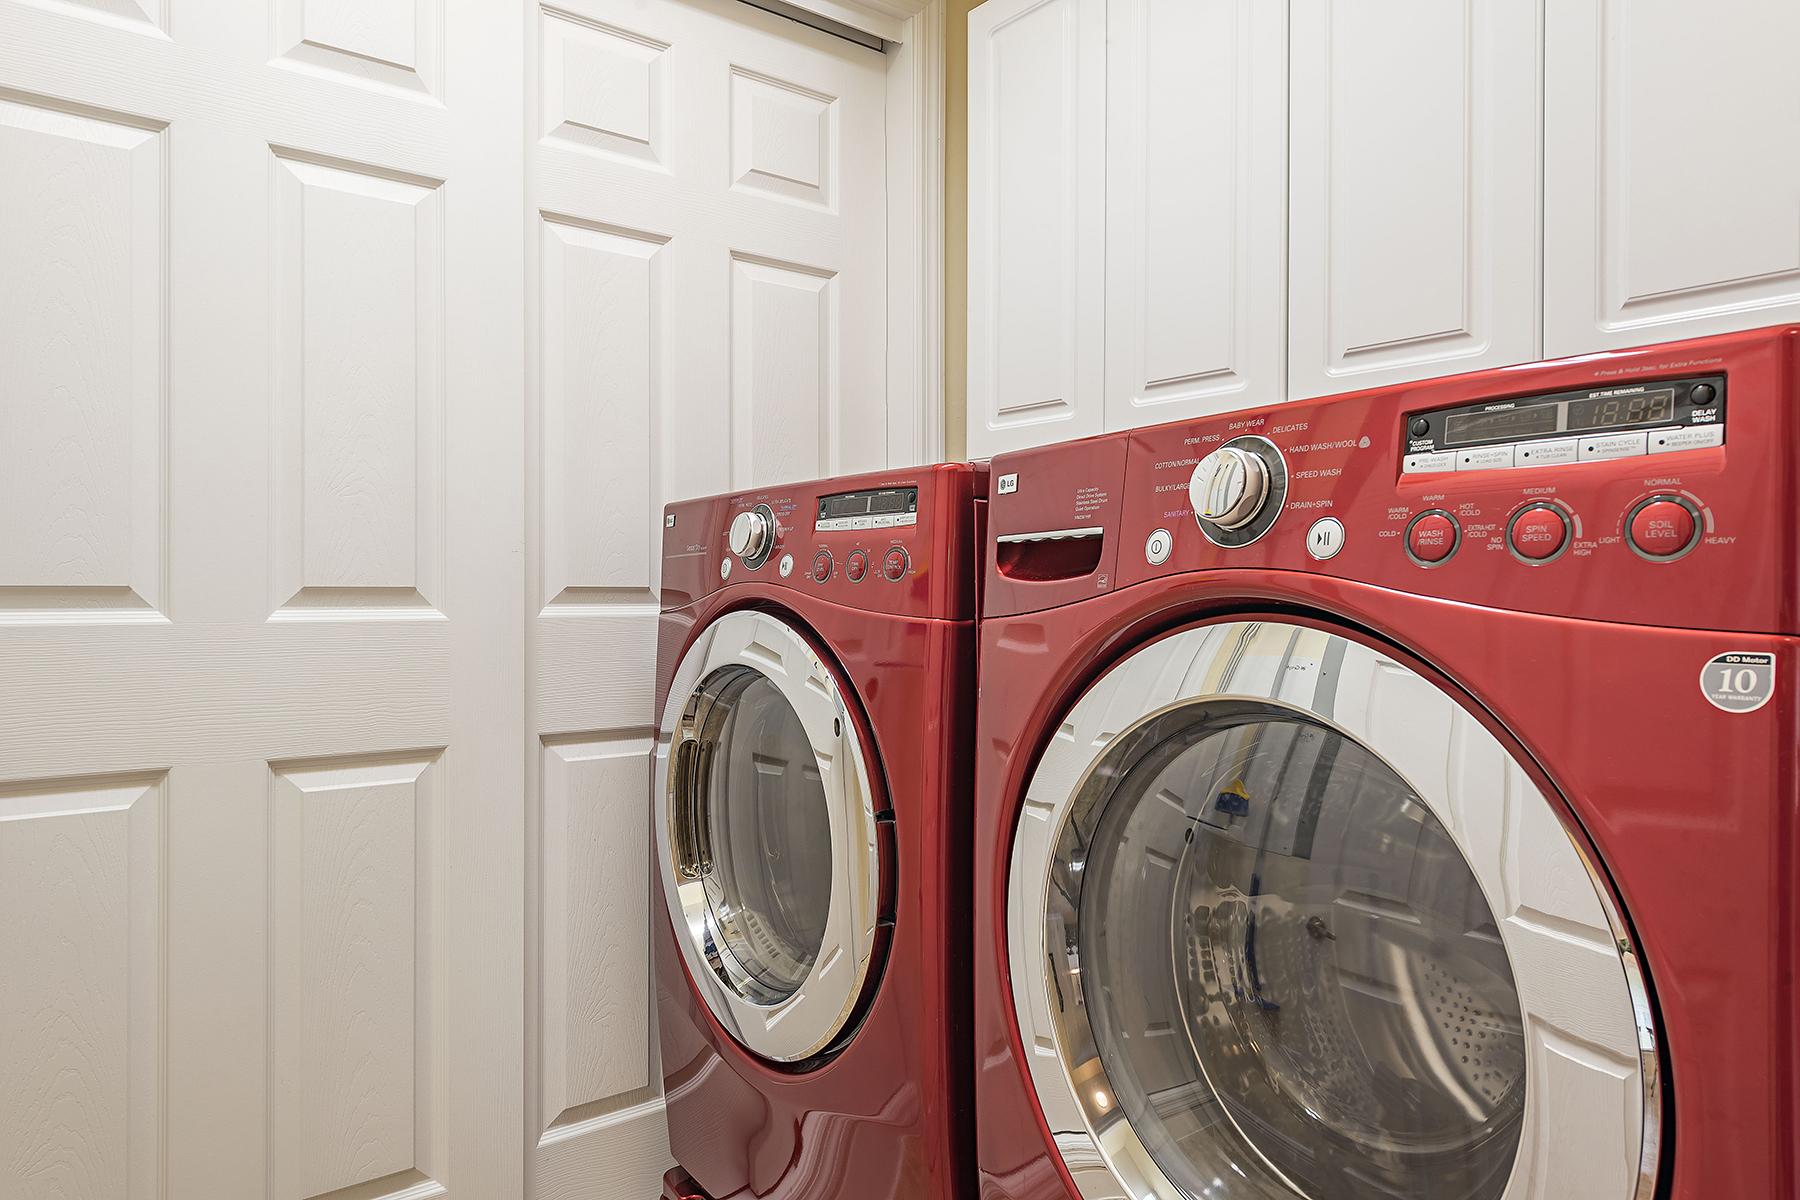 Additional photo for property listing at VASARI - MATERA 28412  Altessa Way 203,  Bonita Springs, Florida 34135 United States